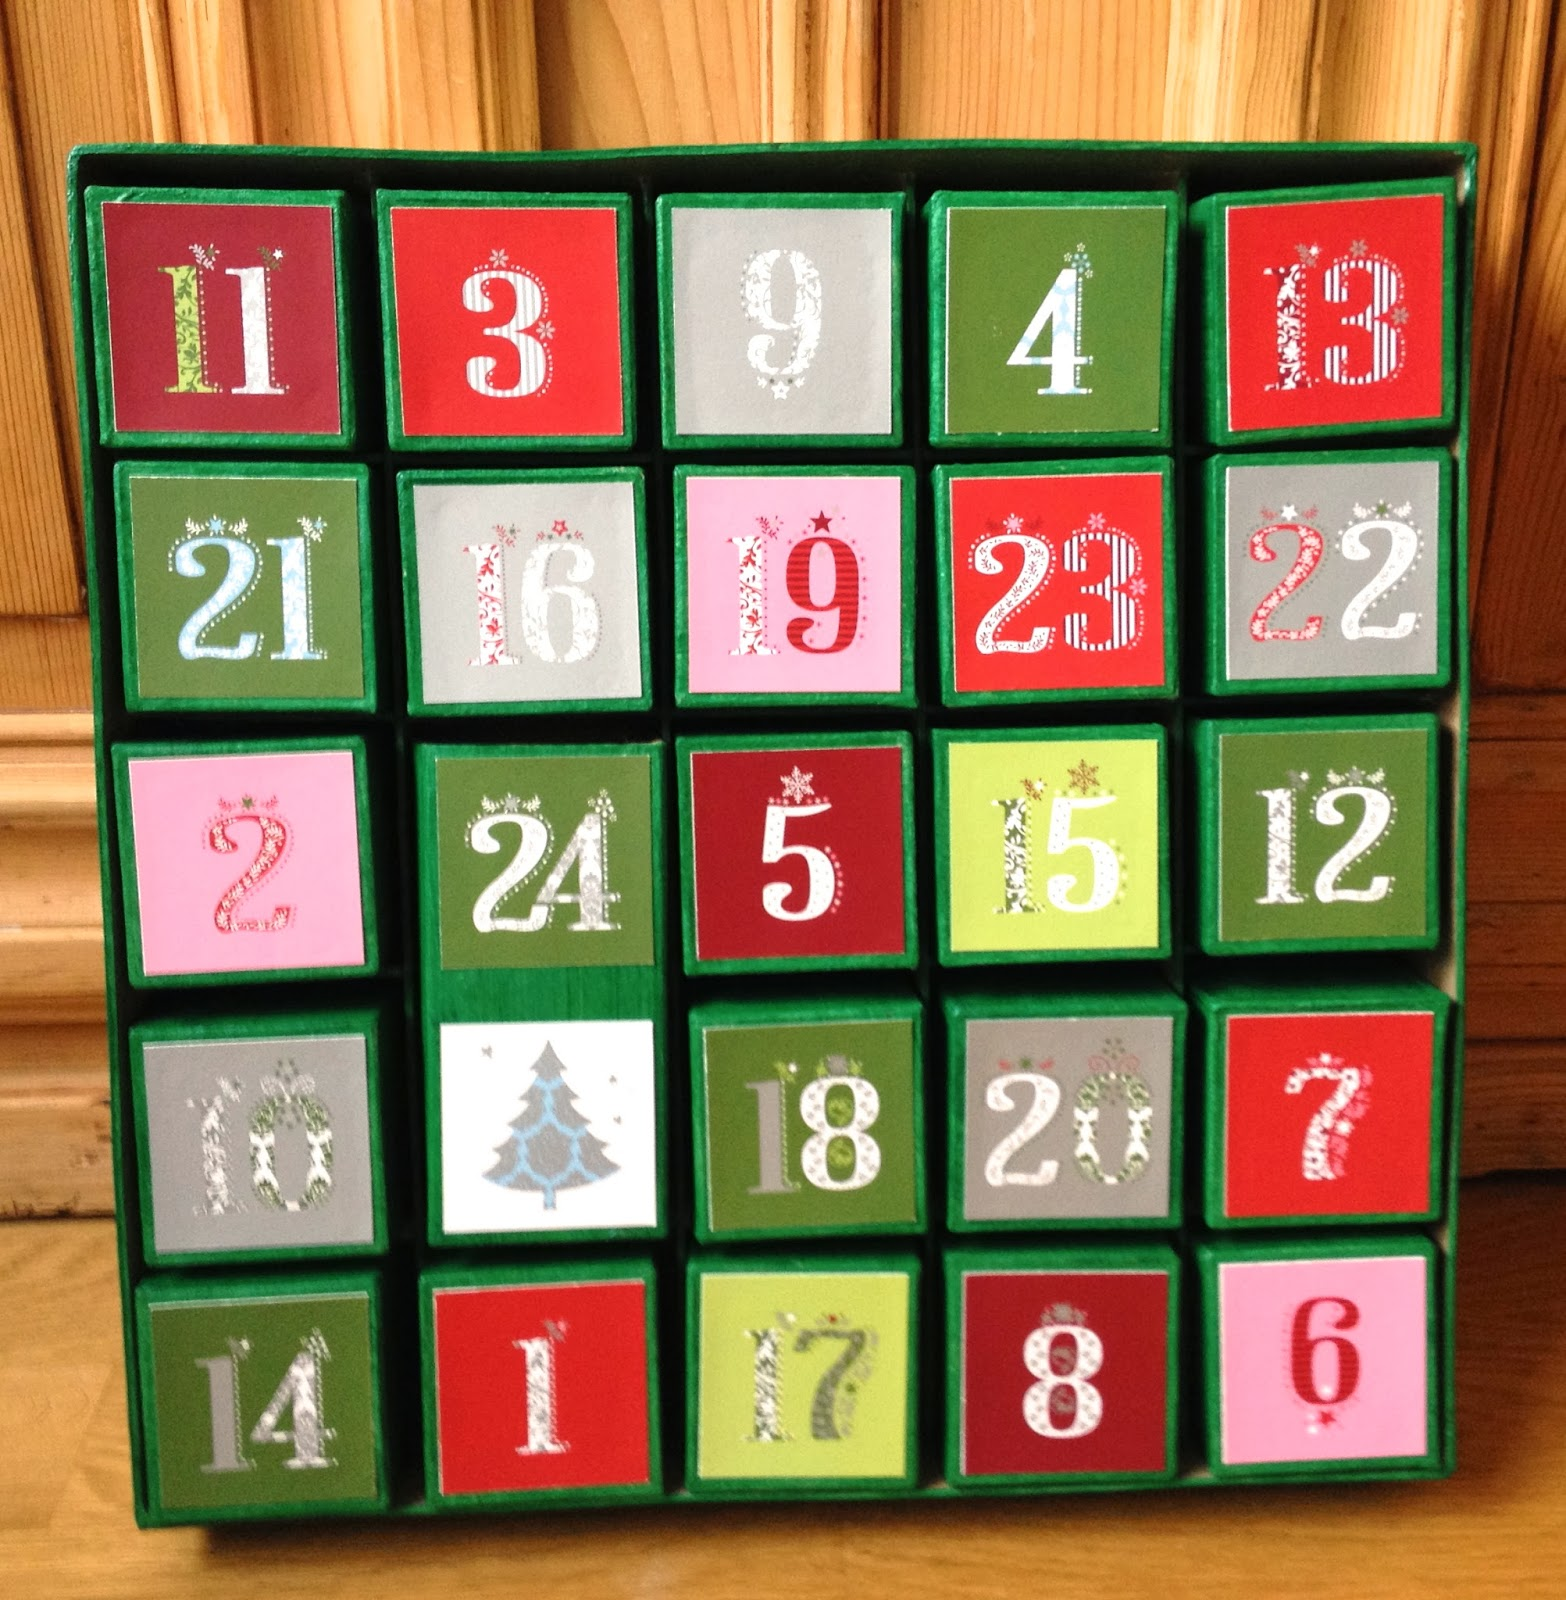 calendrier de l 39 avent 24 tiroirs d corer how to decorate an advent calendar wit 24 drawers. Black Bedroom Furniture Sets. Home Design Ideas